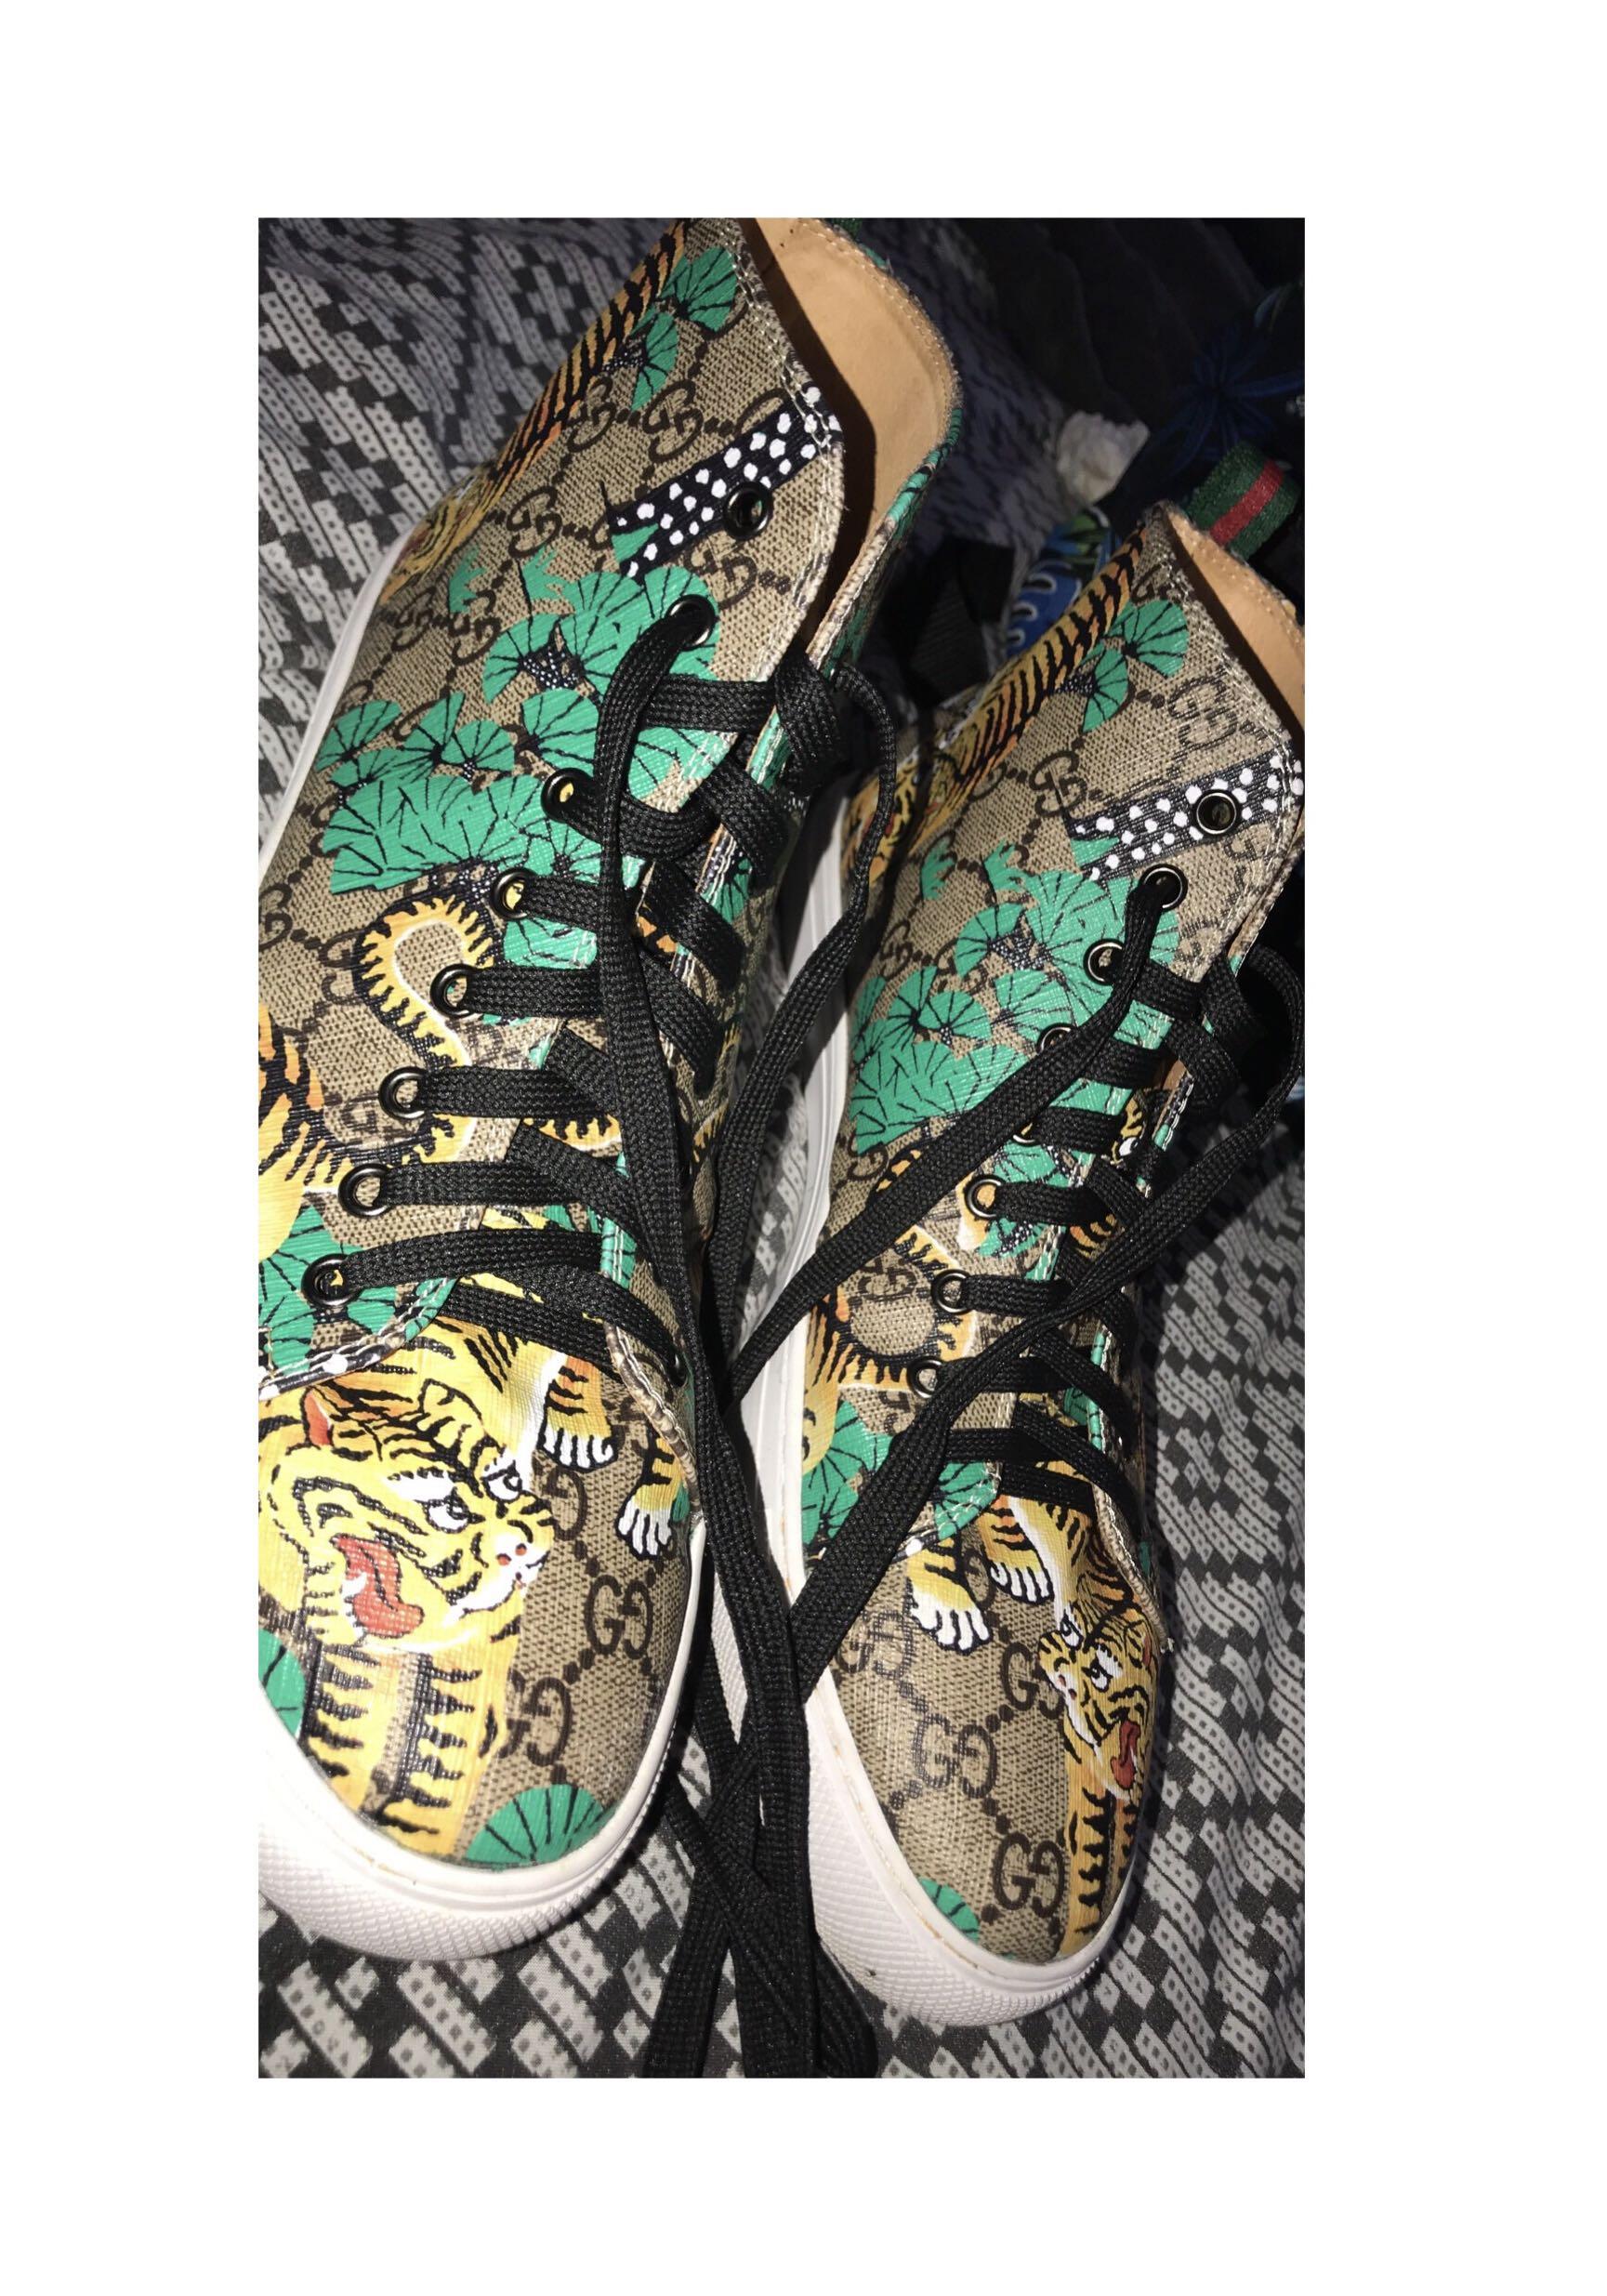 Gucci Bengal Shoes 9.5 UK